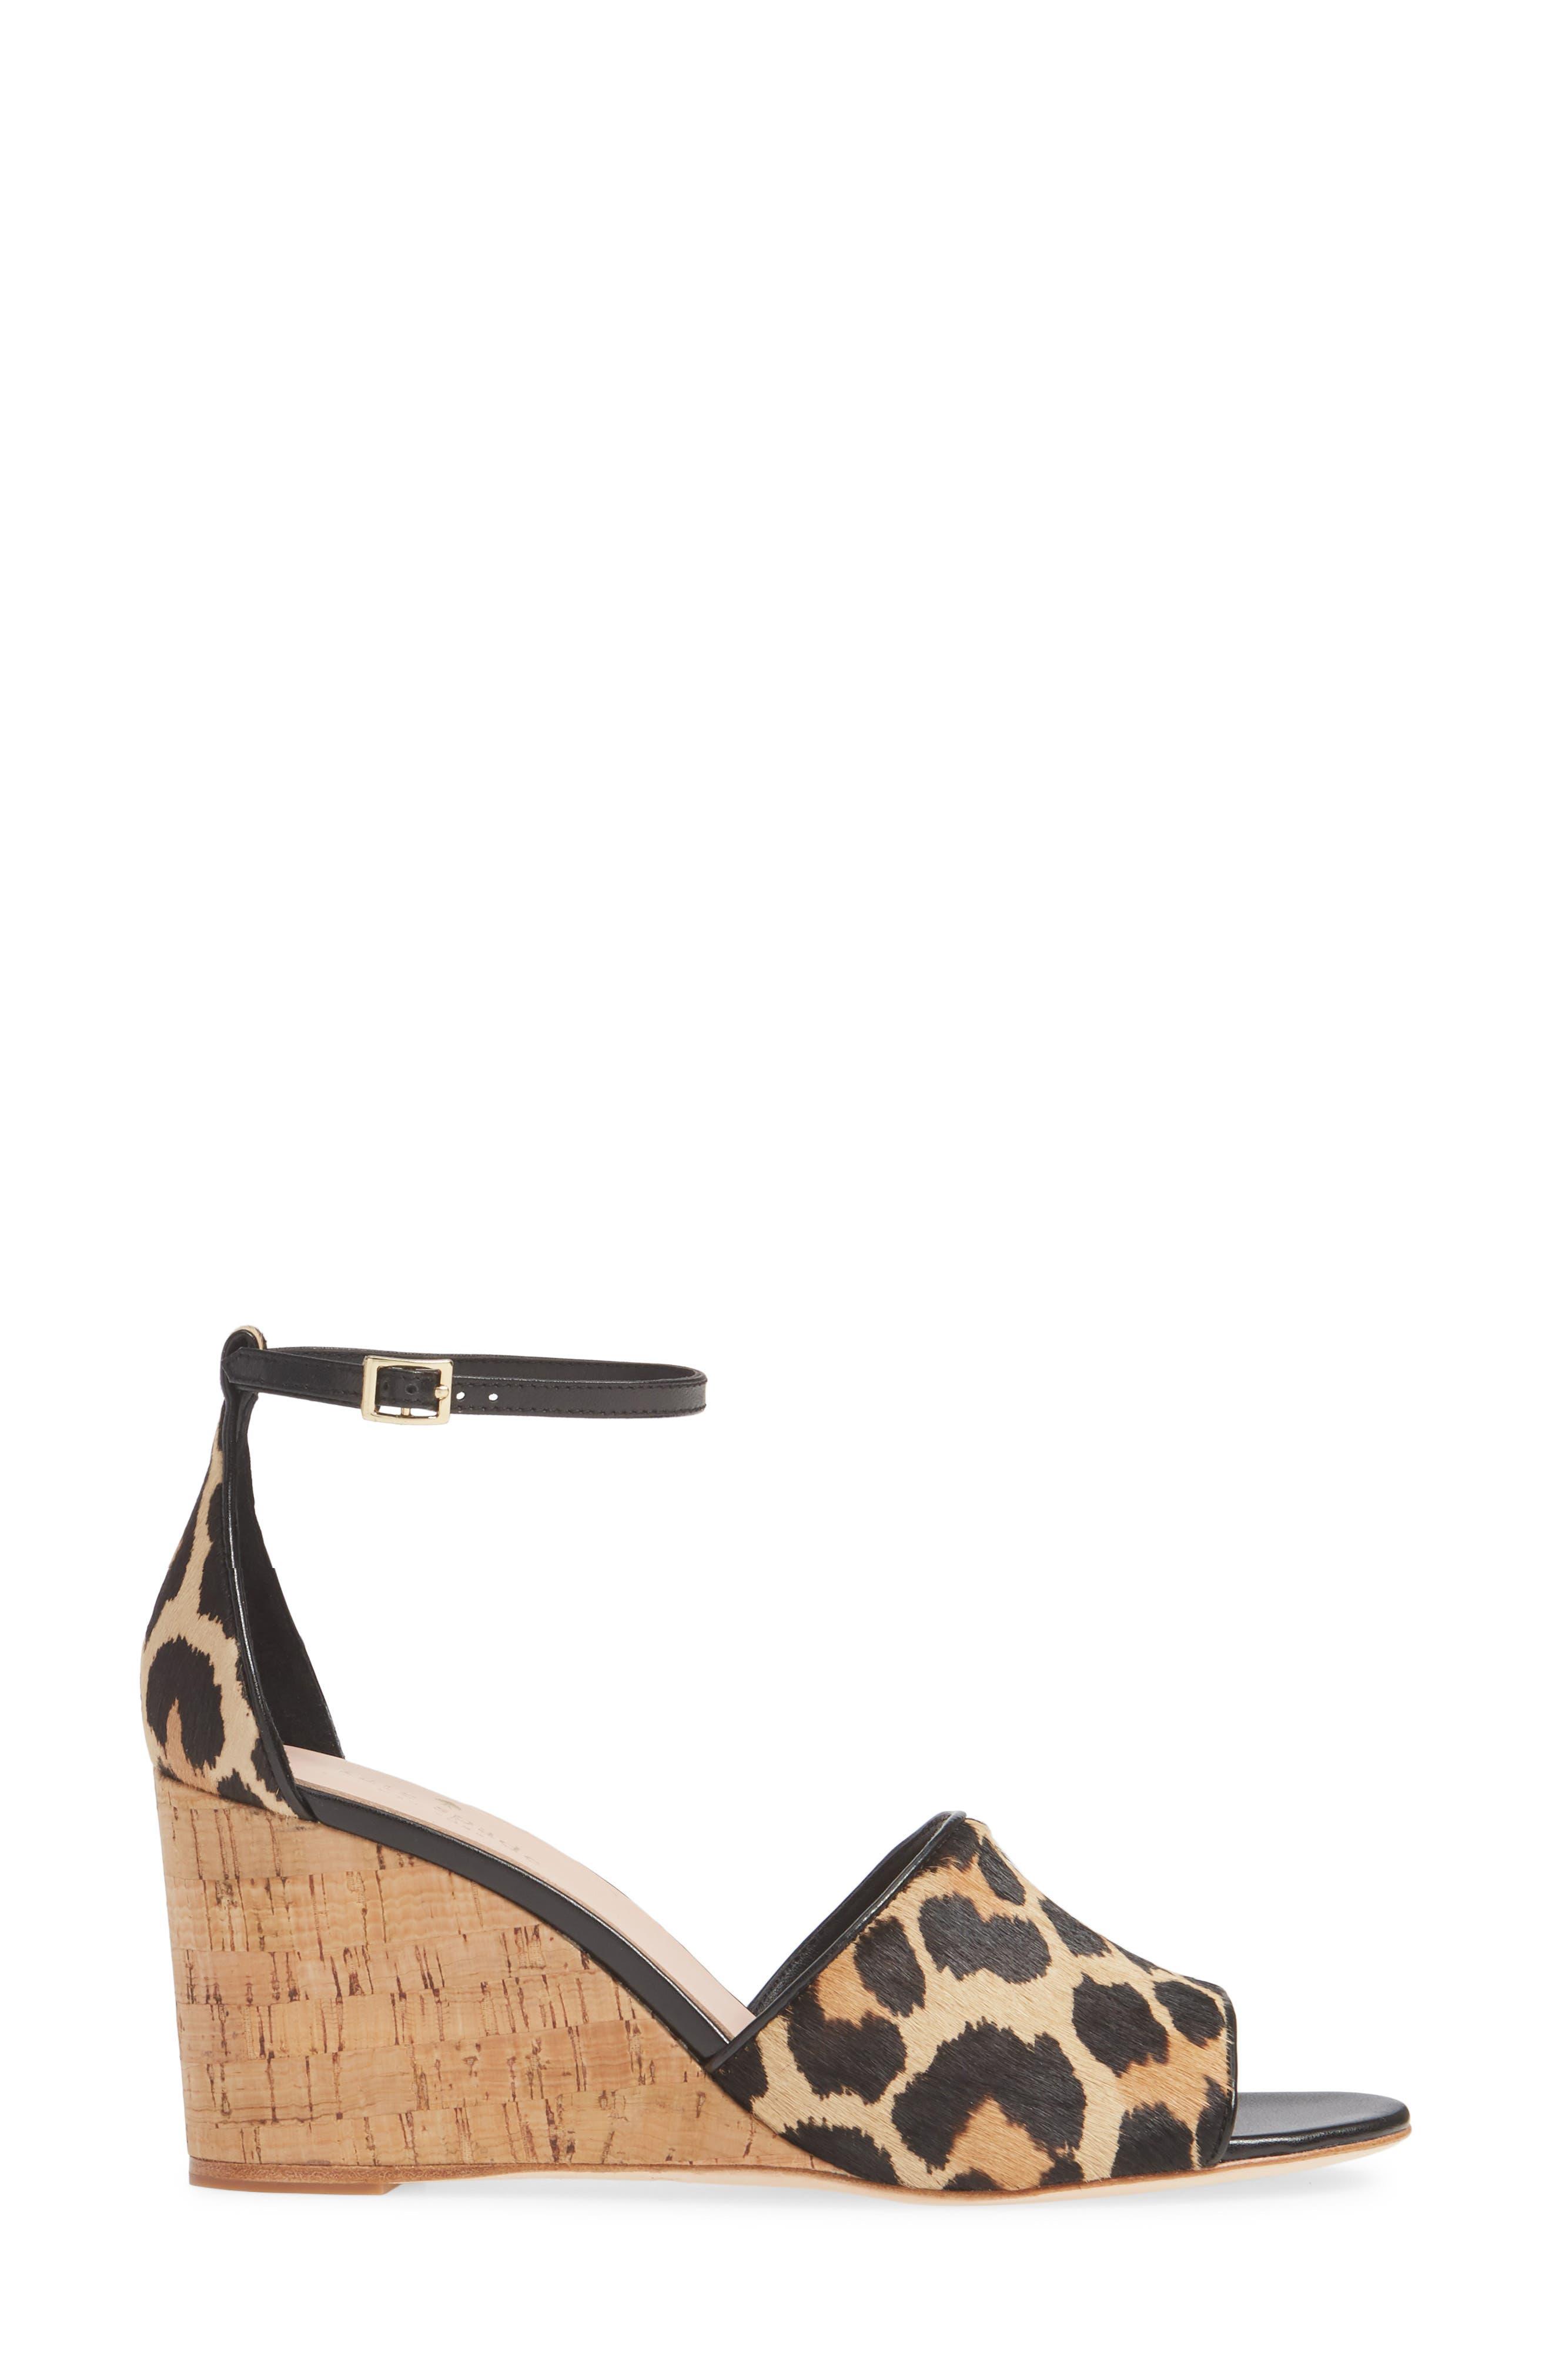 KATE SPADE NEW YORK,                             lonnie genuine calf hair wedge sandal,                             Alternate thumbnail 3, color,                             BLACK/ AMARETTO LEOPARD